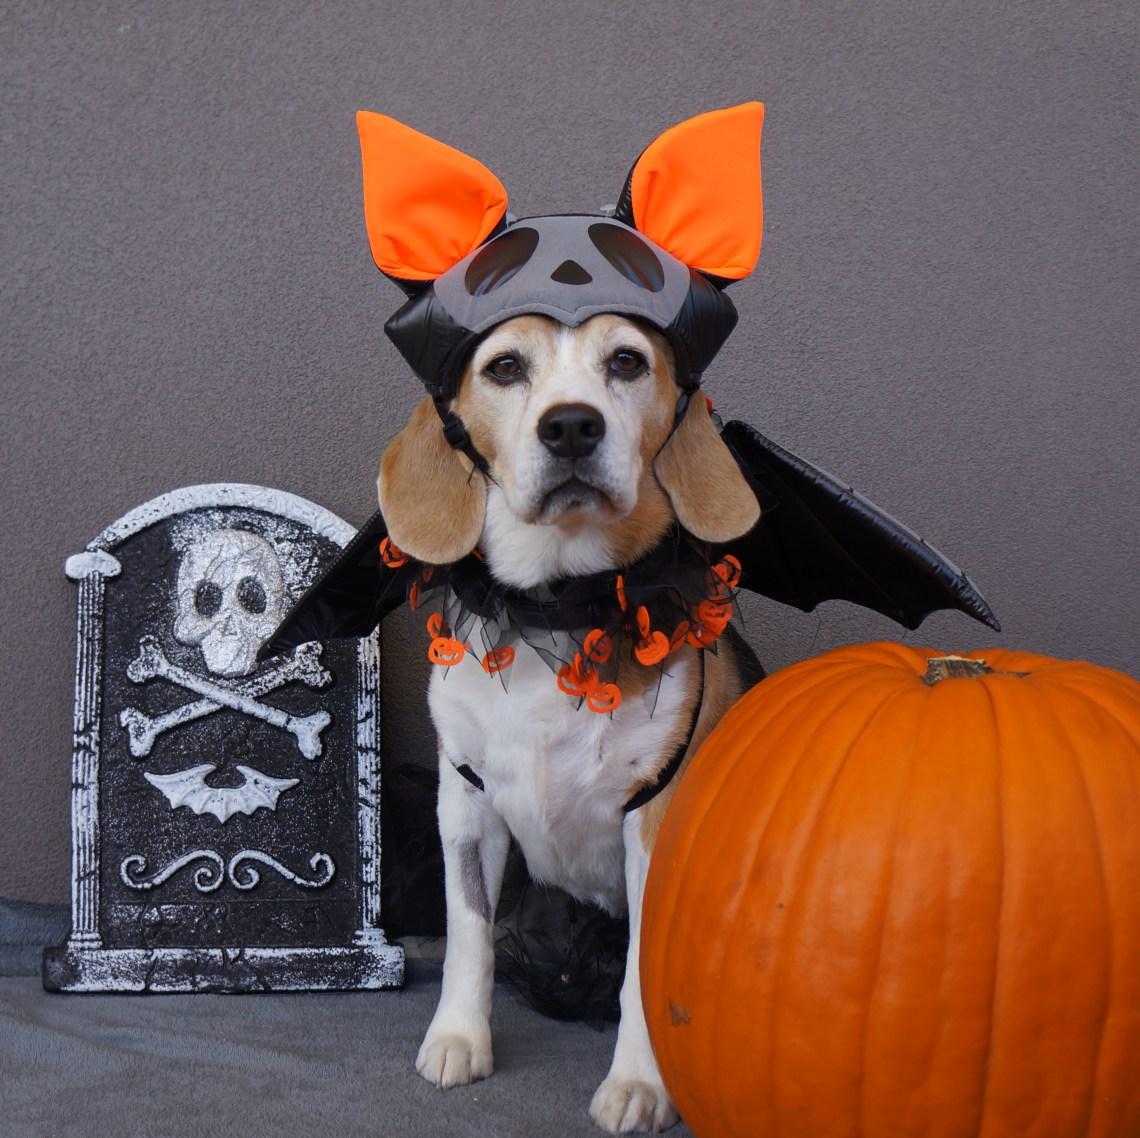 8 amazing halloween dog costume ideas perfect for beagles - beagleswoof